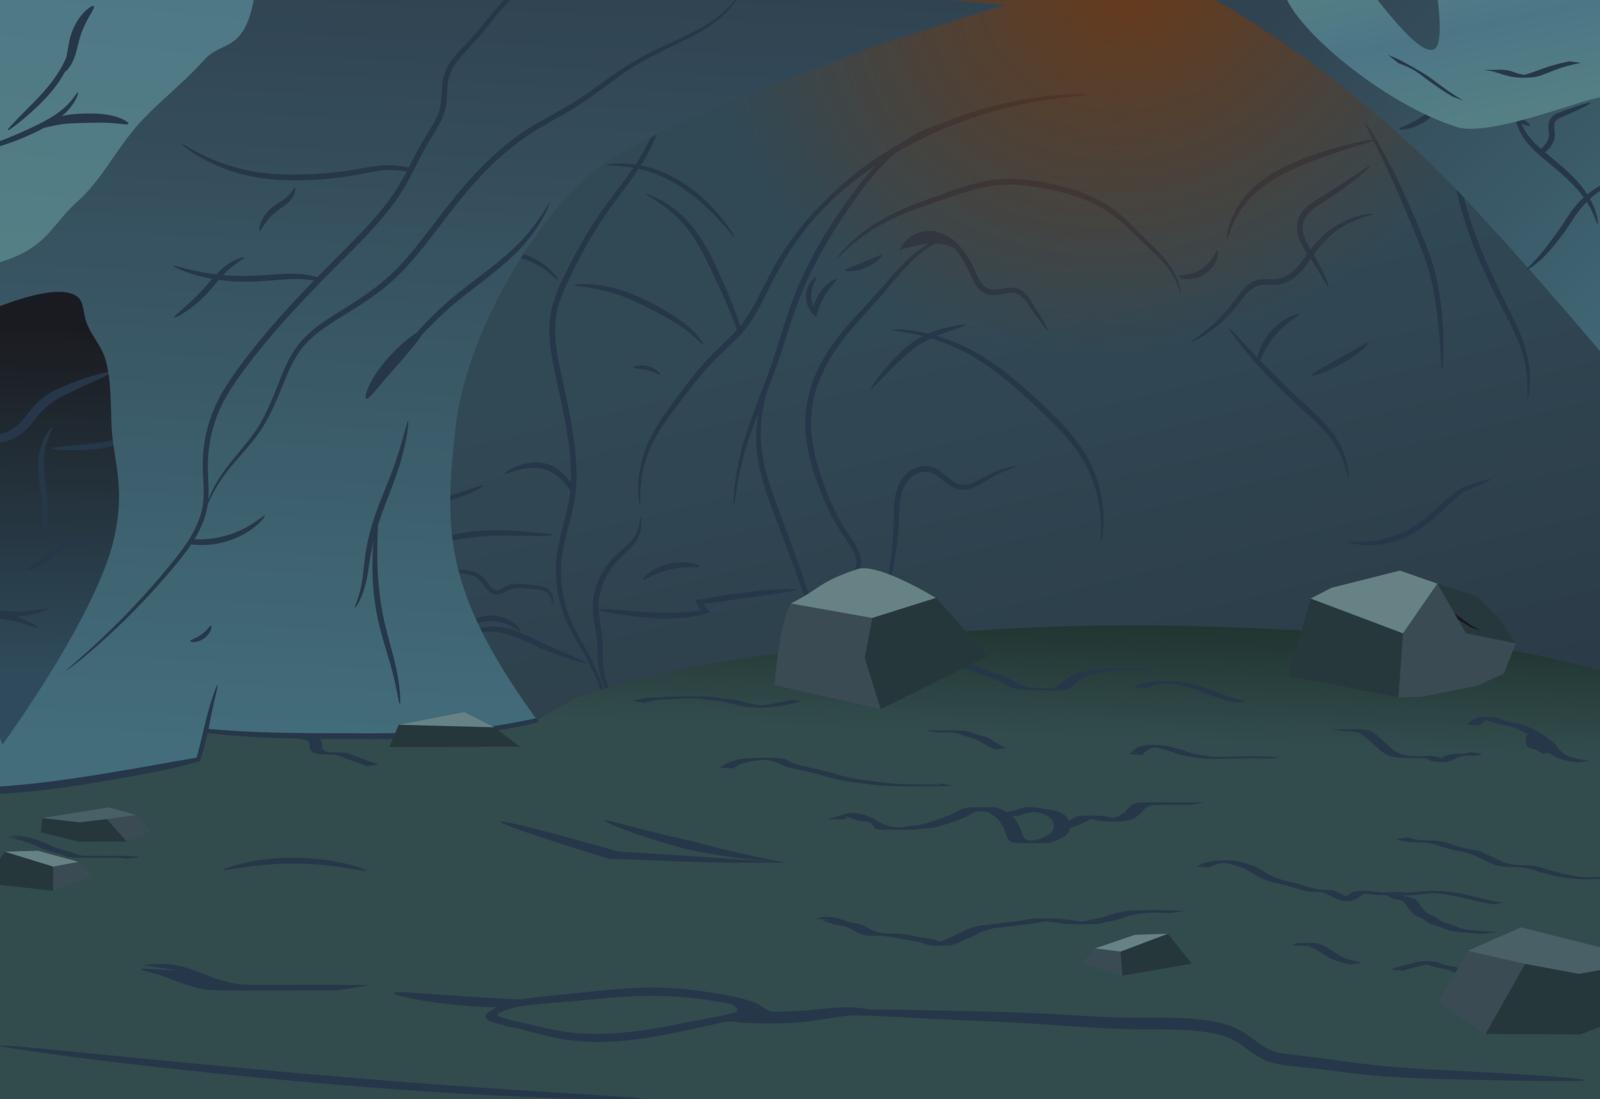 Cave Background Vector by Proenix on deviantART (Proenix